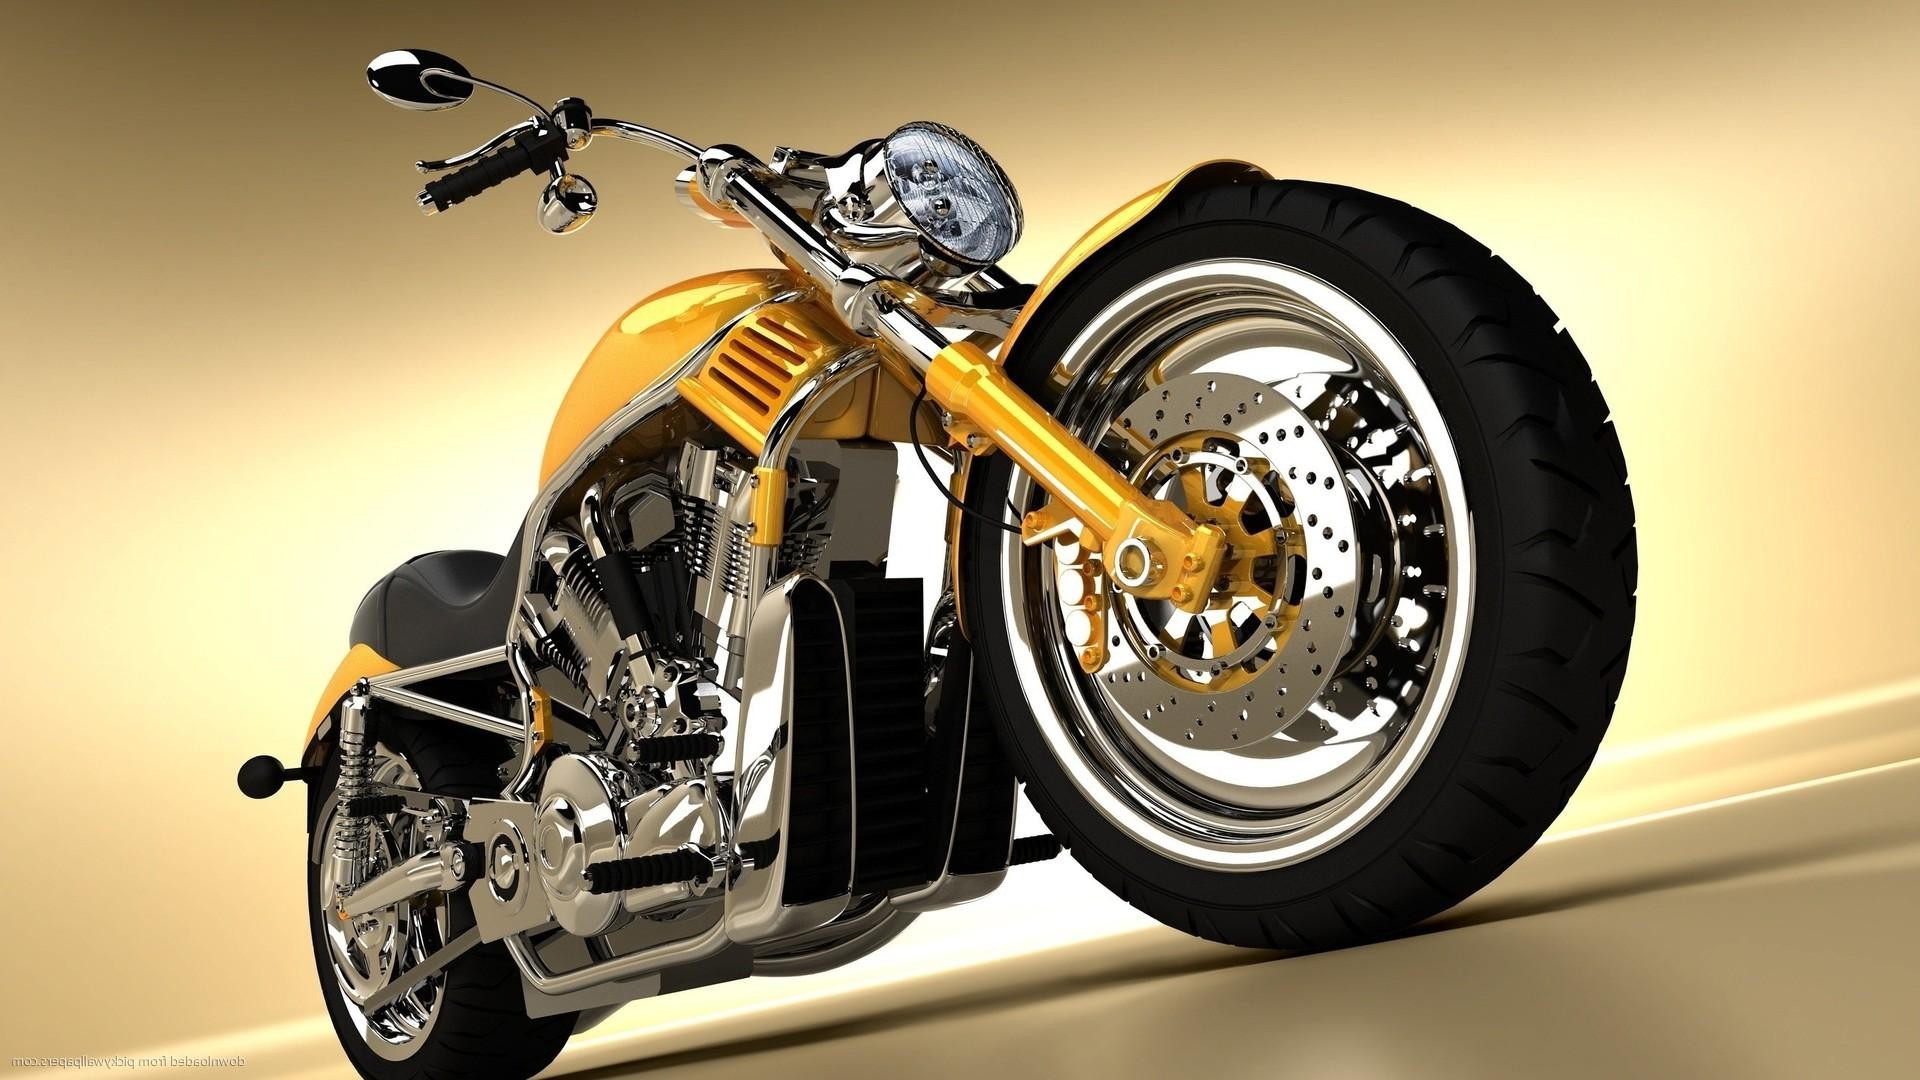 Harley Davidson Bikes Dekstop Wallpaper 2227 Wallpaper 1920x1080